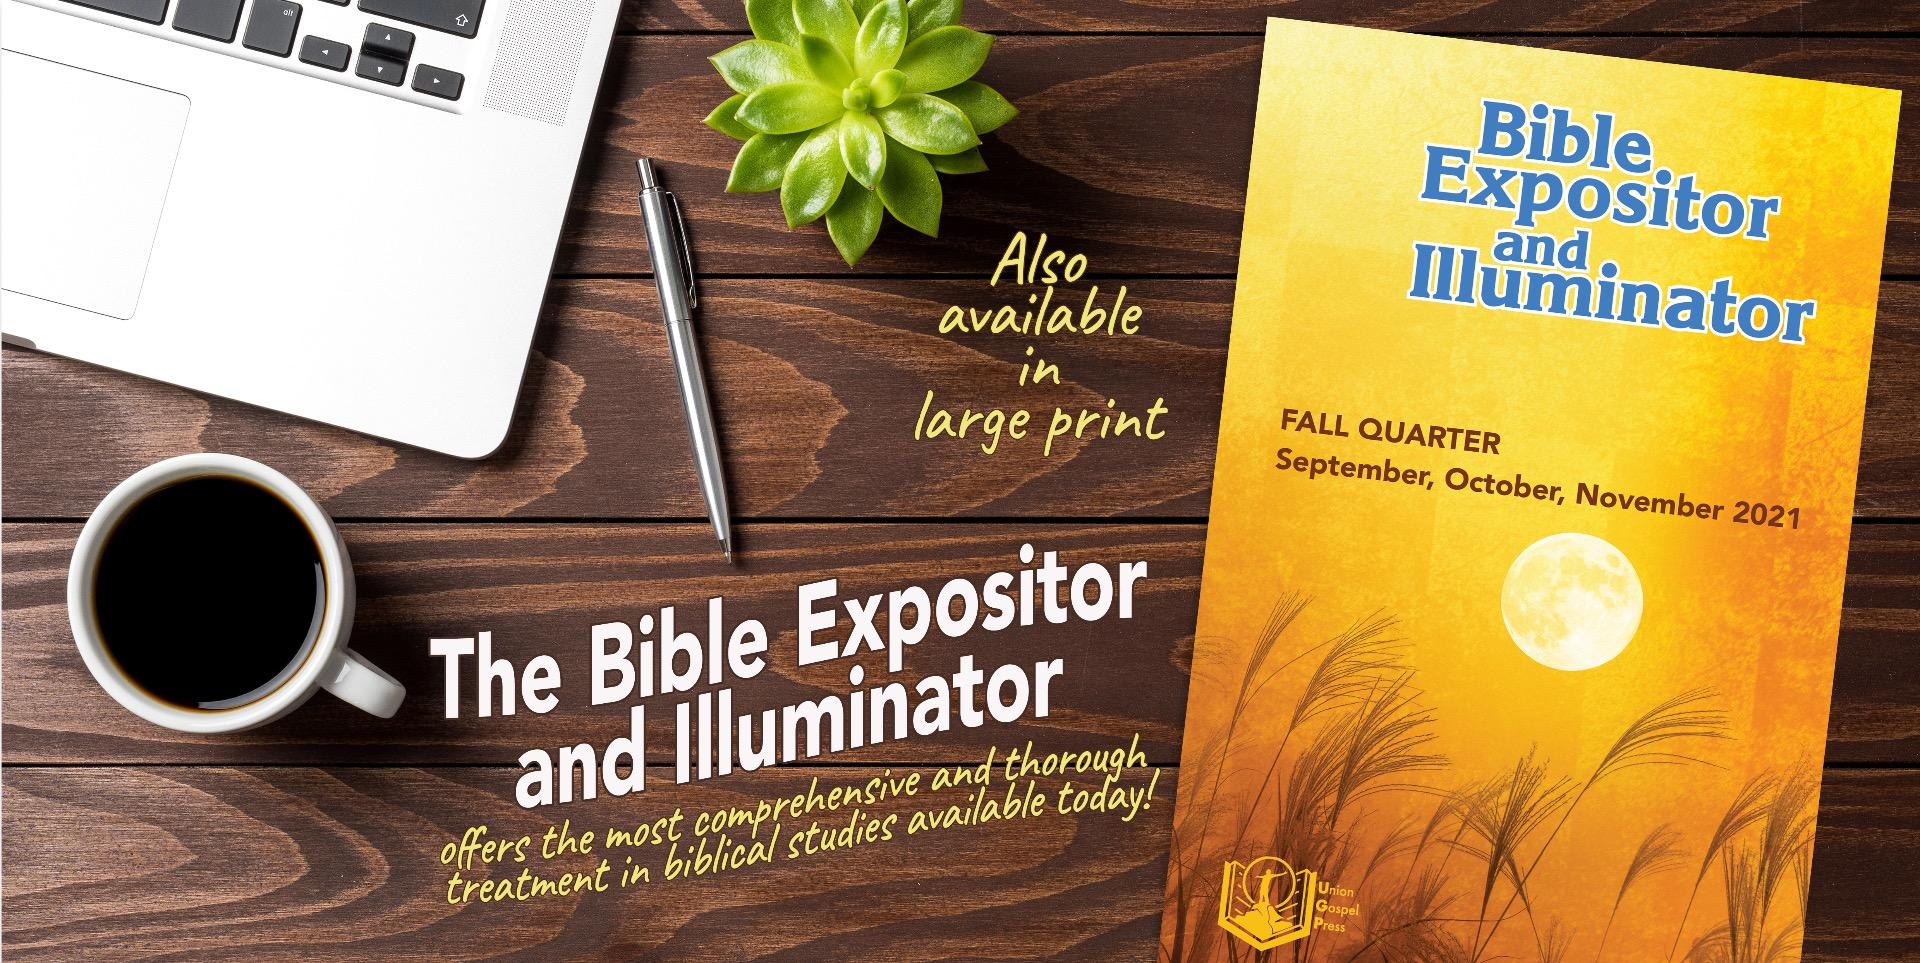 Bible Expositor